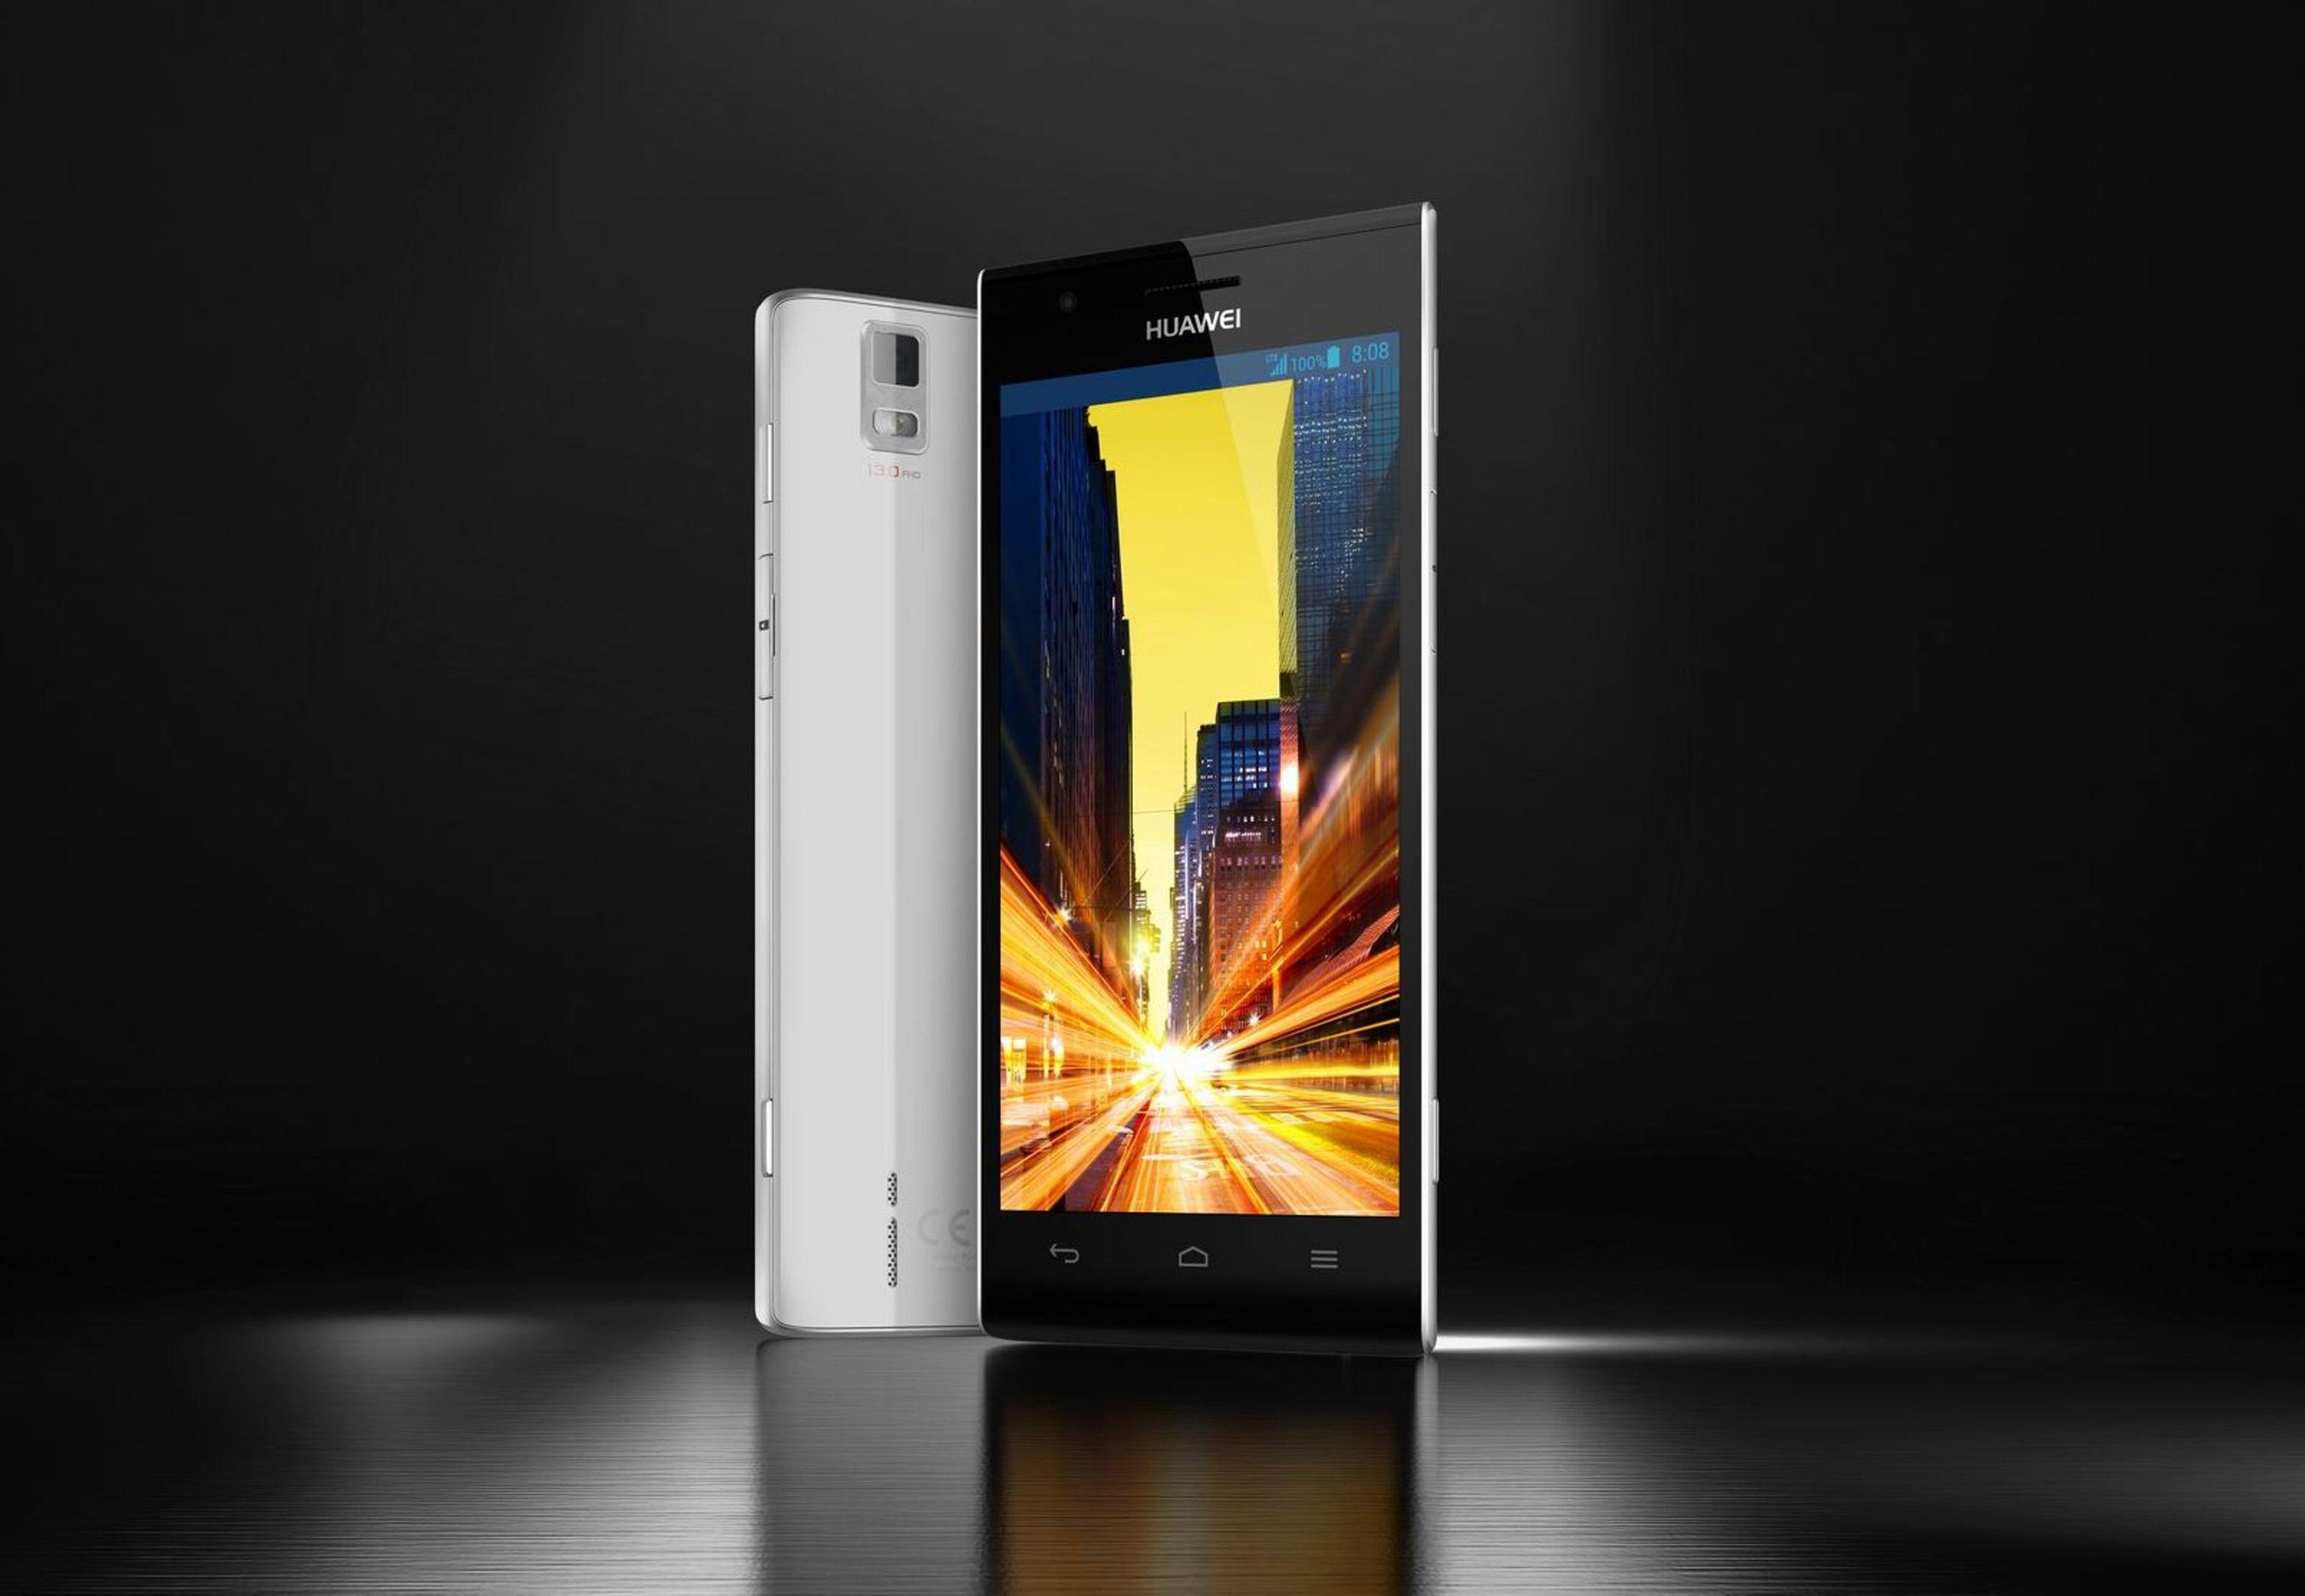 Huawei unveils 'world's fastest smartphone'